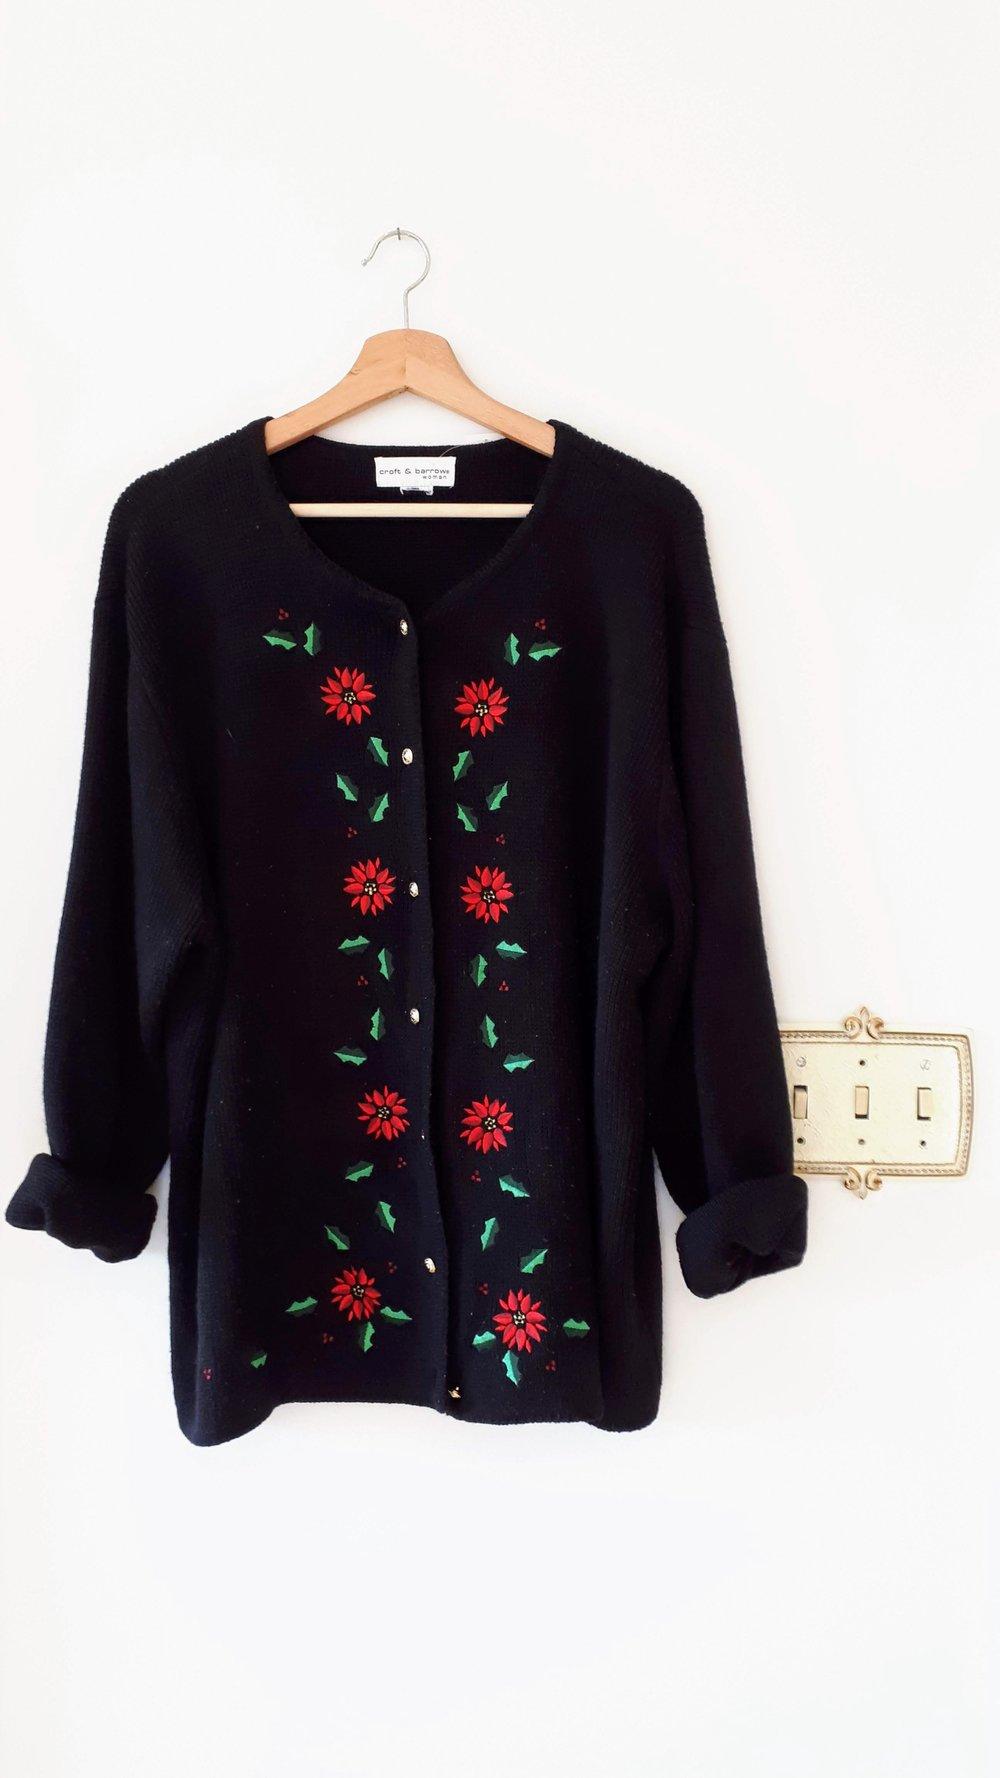 Sweater; Size L, $22